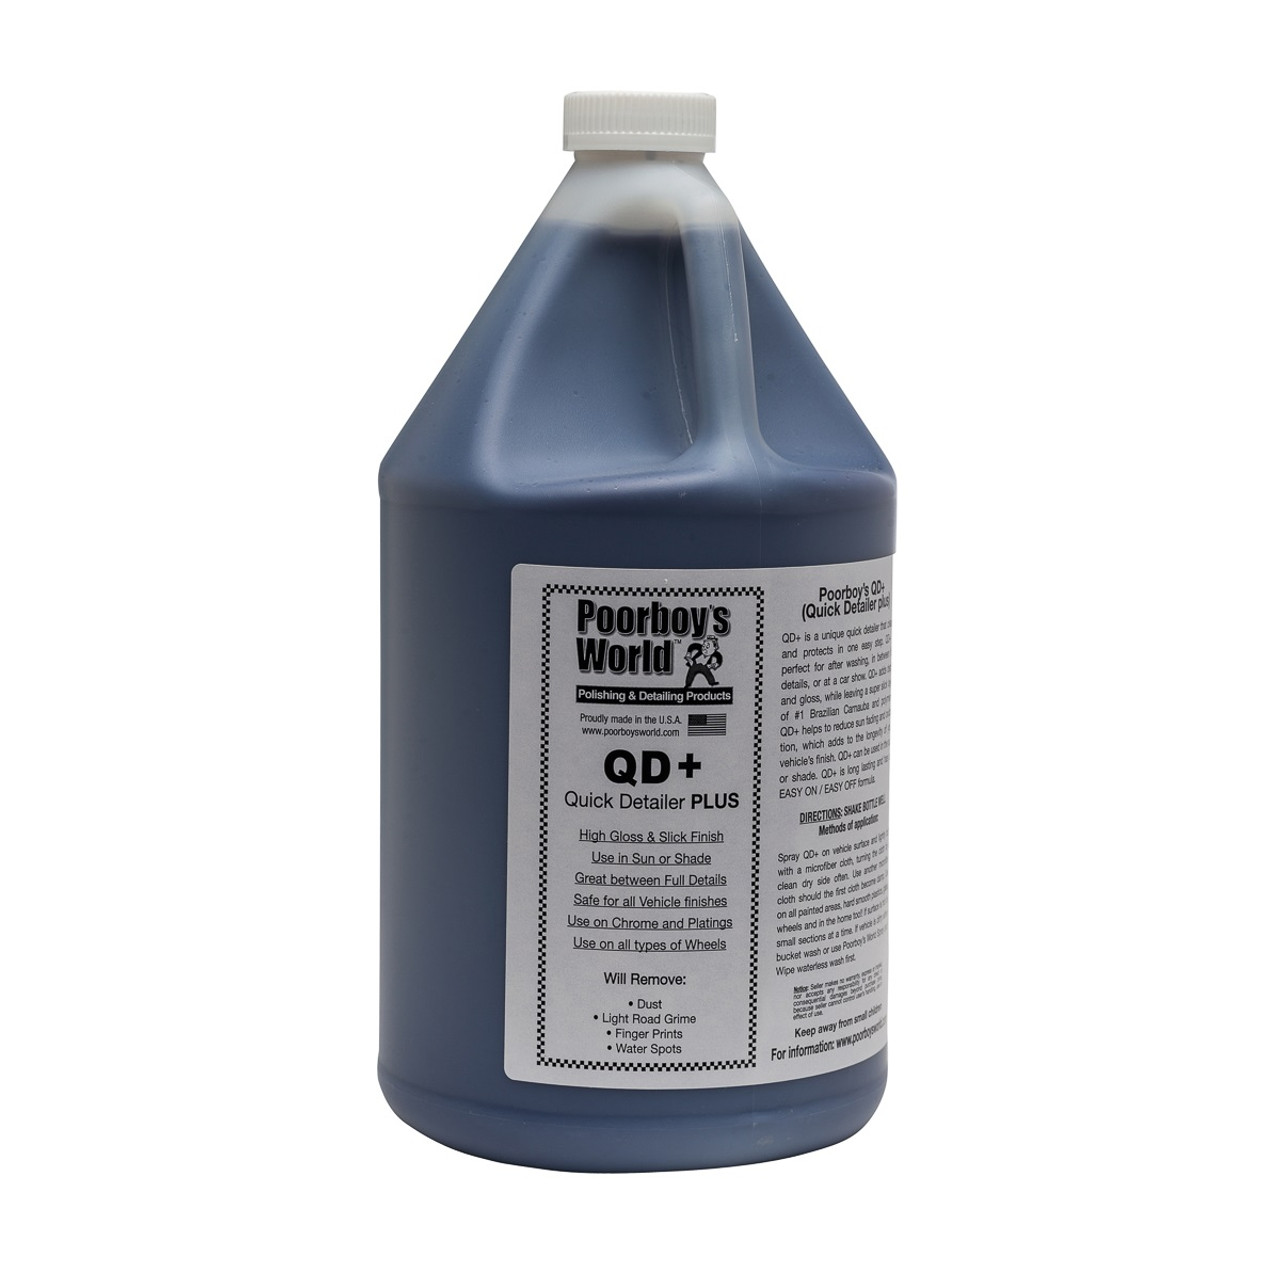 Poorboy's World QD+ Gallon